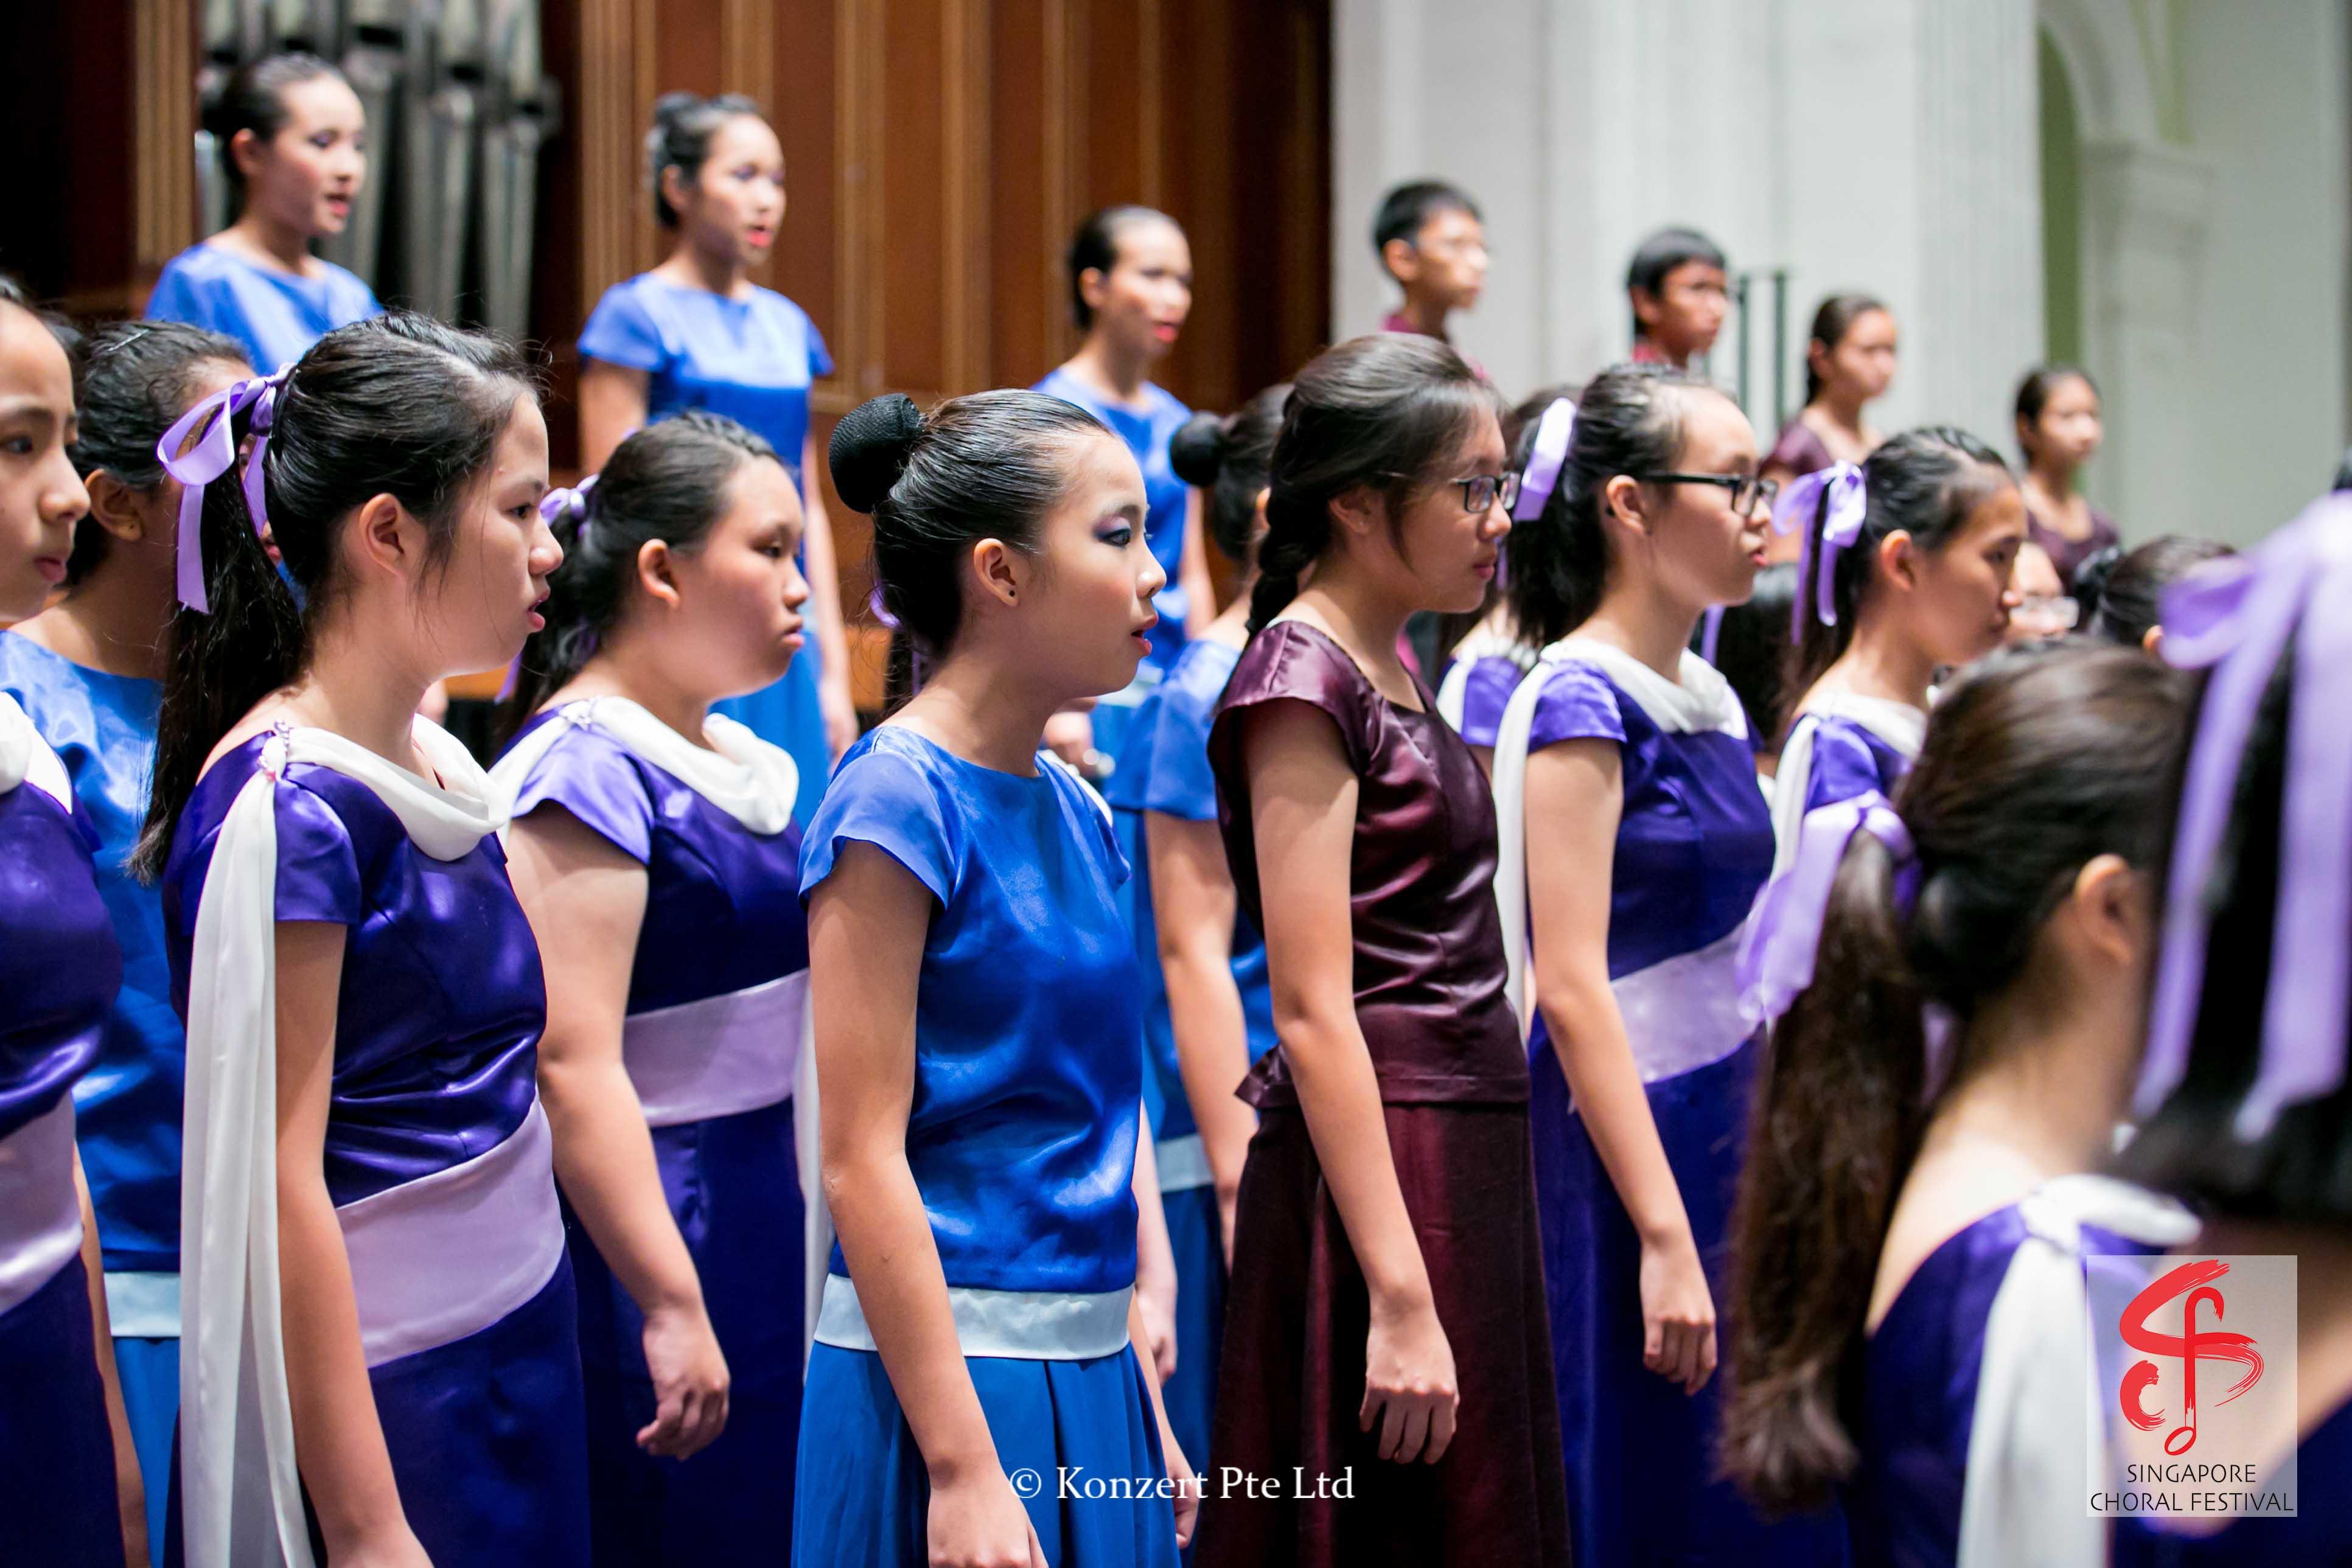 Singapore Choral Festival 7-8-15 (86).jpg